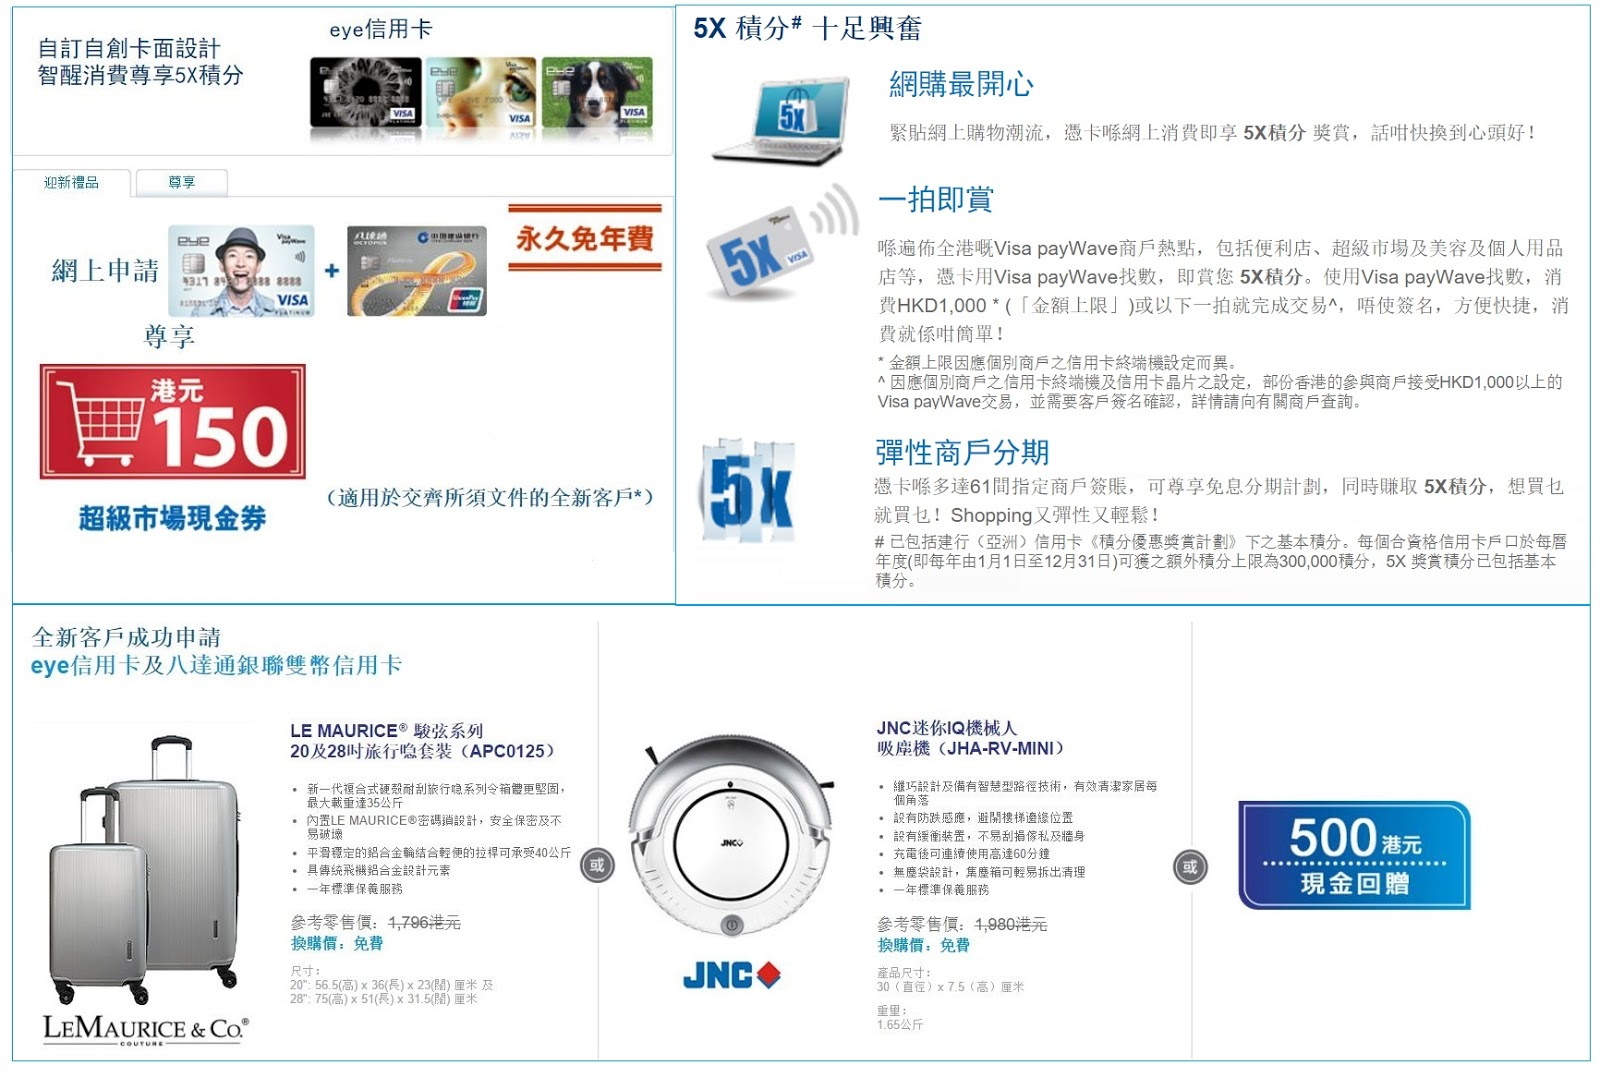 CreditBossHK 信用卡情報網 : 【網上同時申請eye信用卡+建行八達通銀聯雙幣信用卡送多HK$150超市現金券】